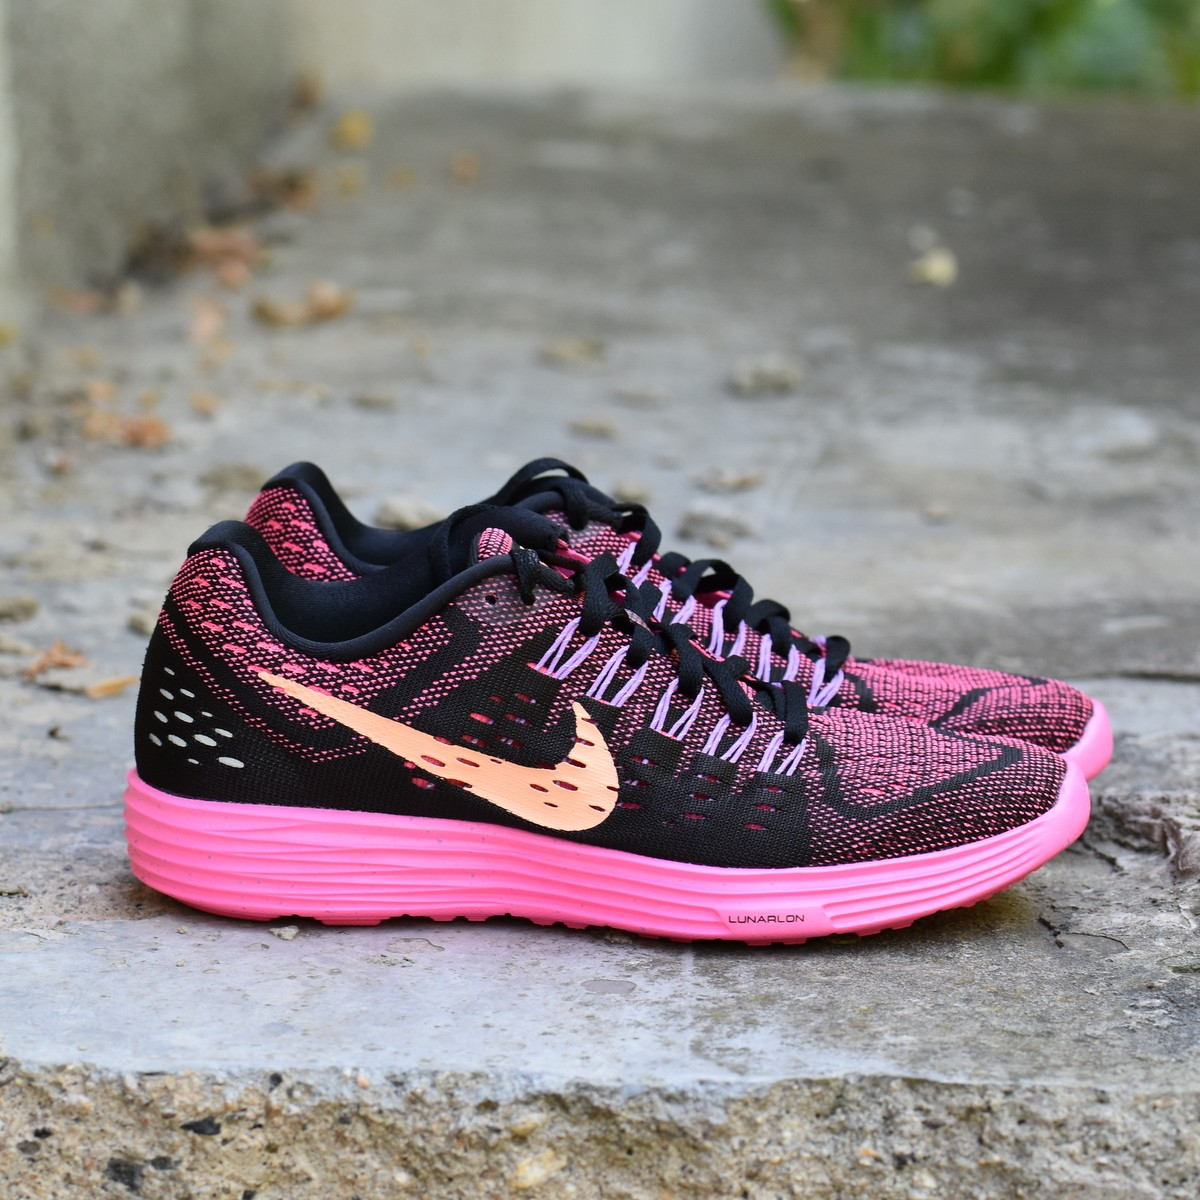 598892caf02 Nike WMNS LUNARTEMPO Dámské boty EU 36 705462-008